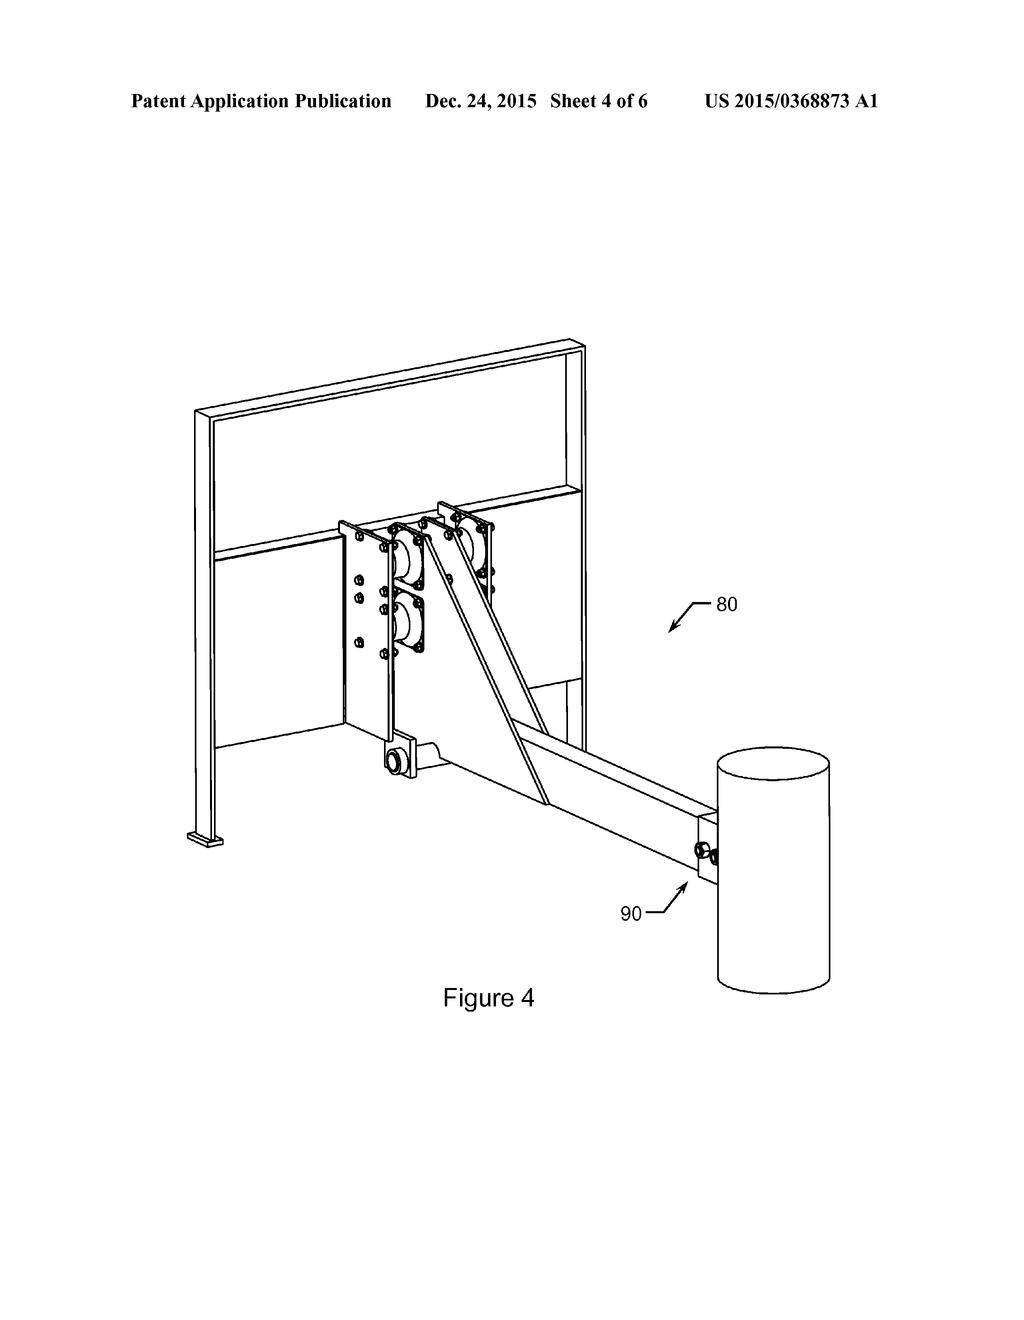 Excavator Hammer Attachment Apparatus Diagram Schematic And Image 05